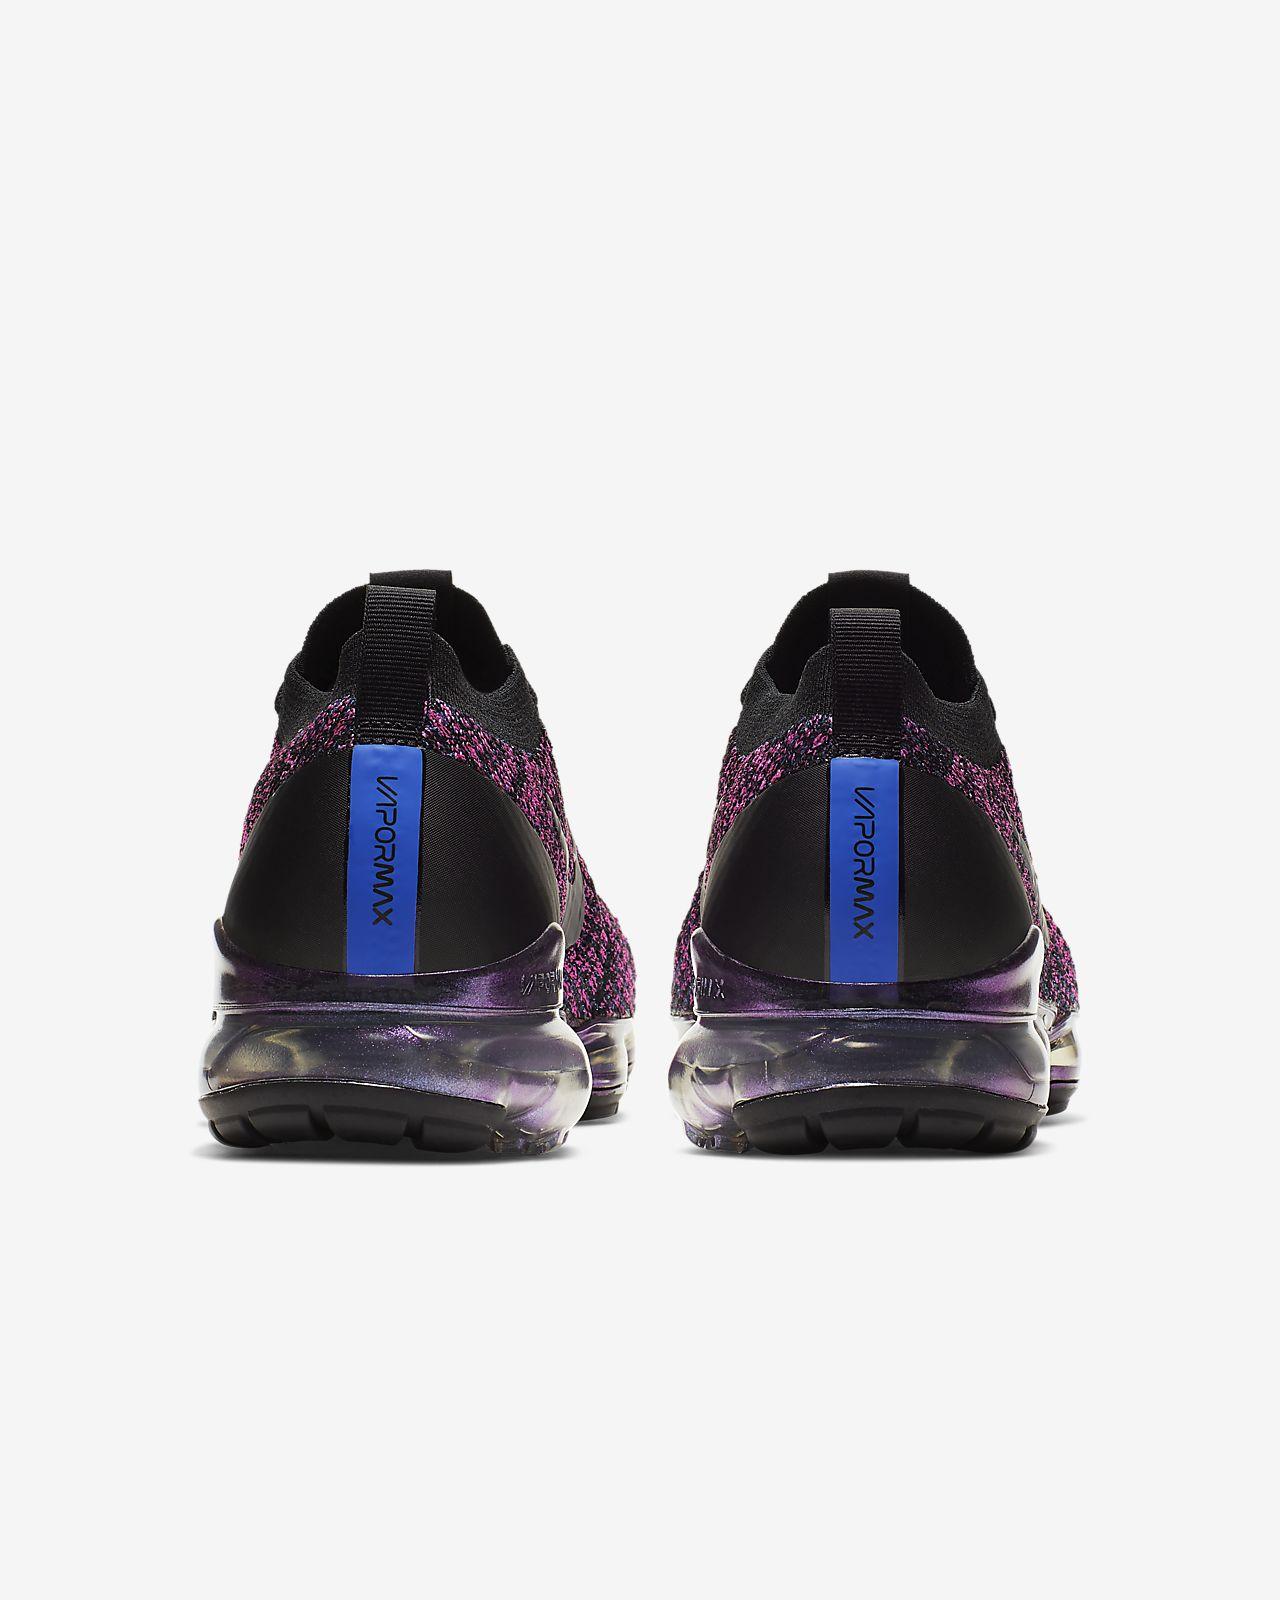 half off 5d736 ae725 ... Nike Air VaporMax Flyknit 3 Men s Shoe